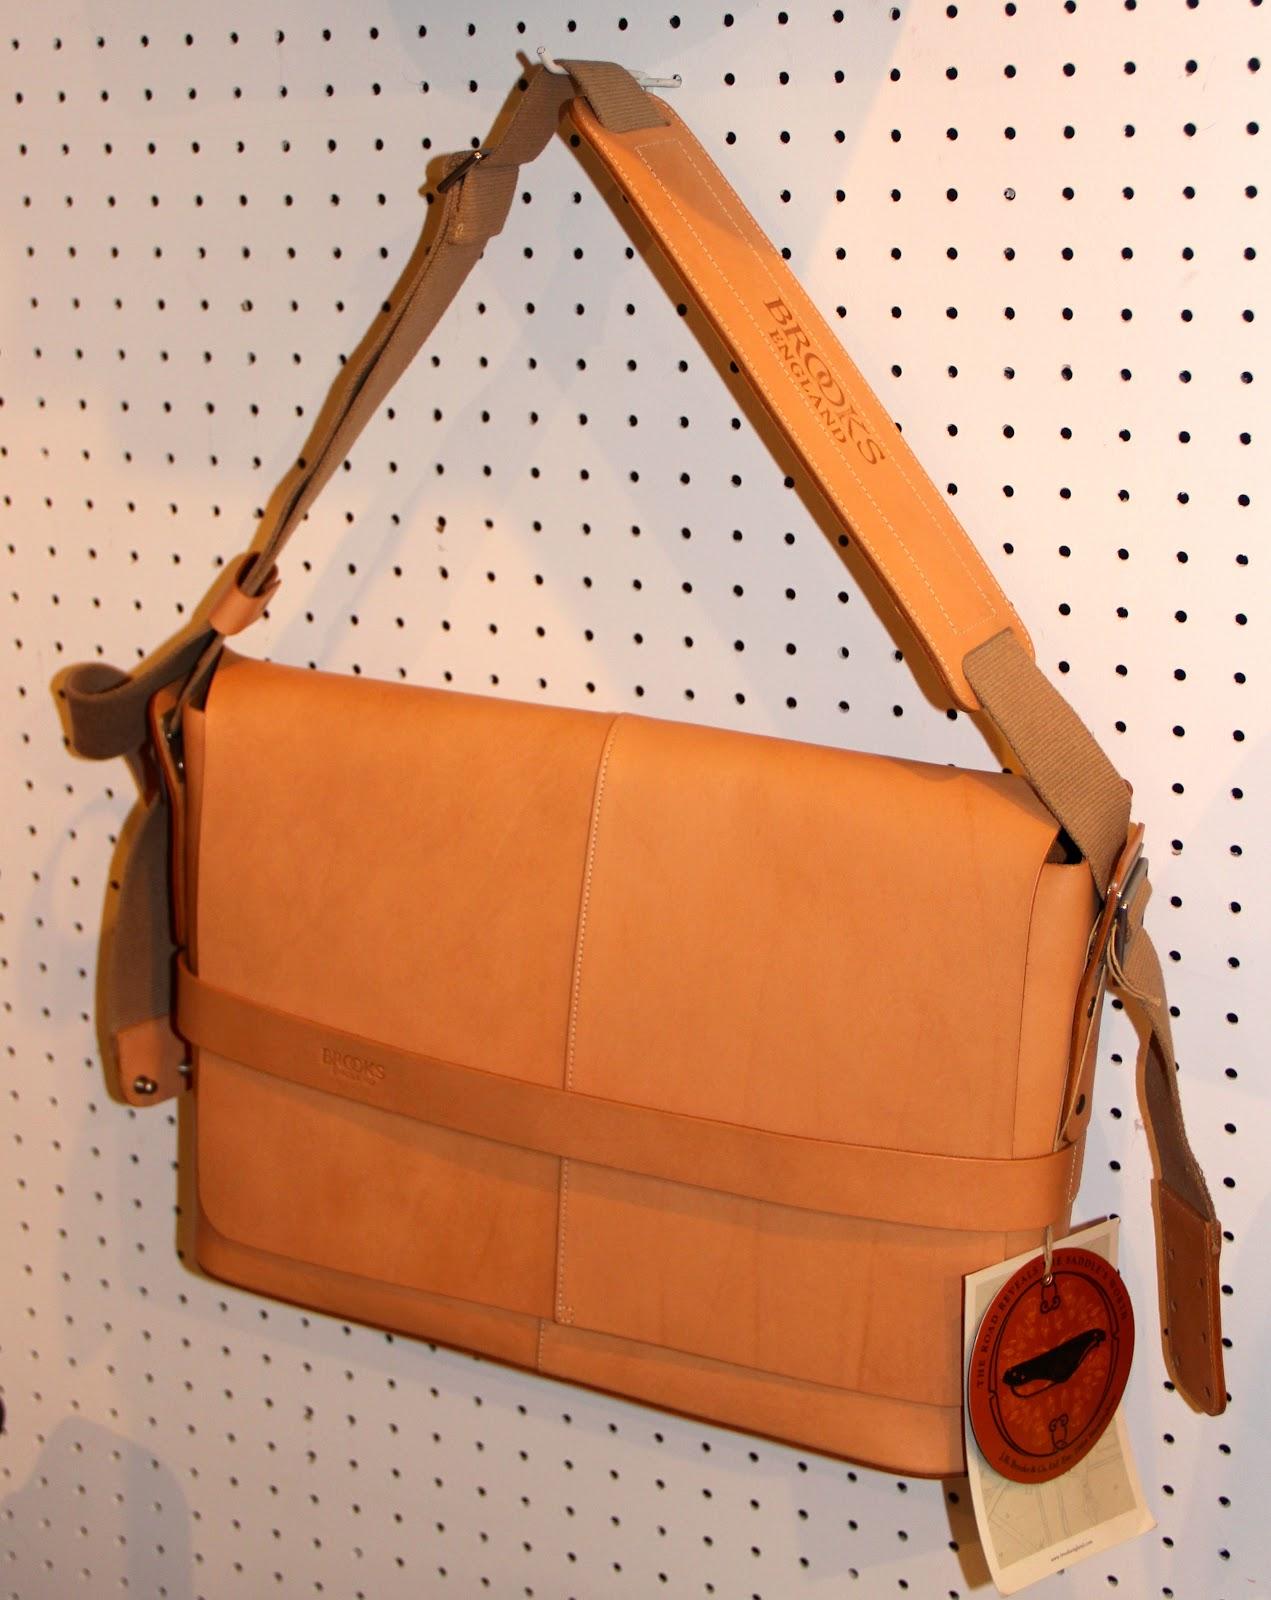 3b75e62d9d54 Made in England Barbican Hard Leather Shoulder Bag vegetable tanned leather  w  adjustable shoulder strap available now